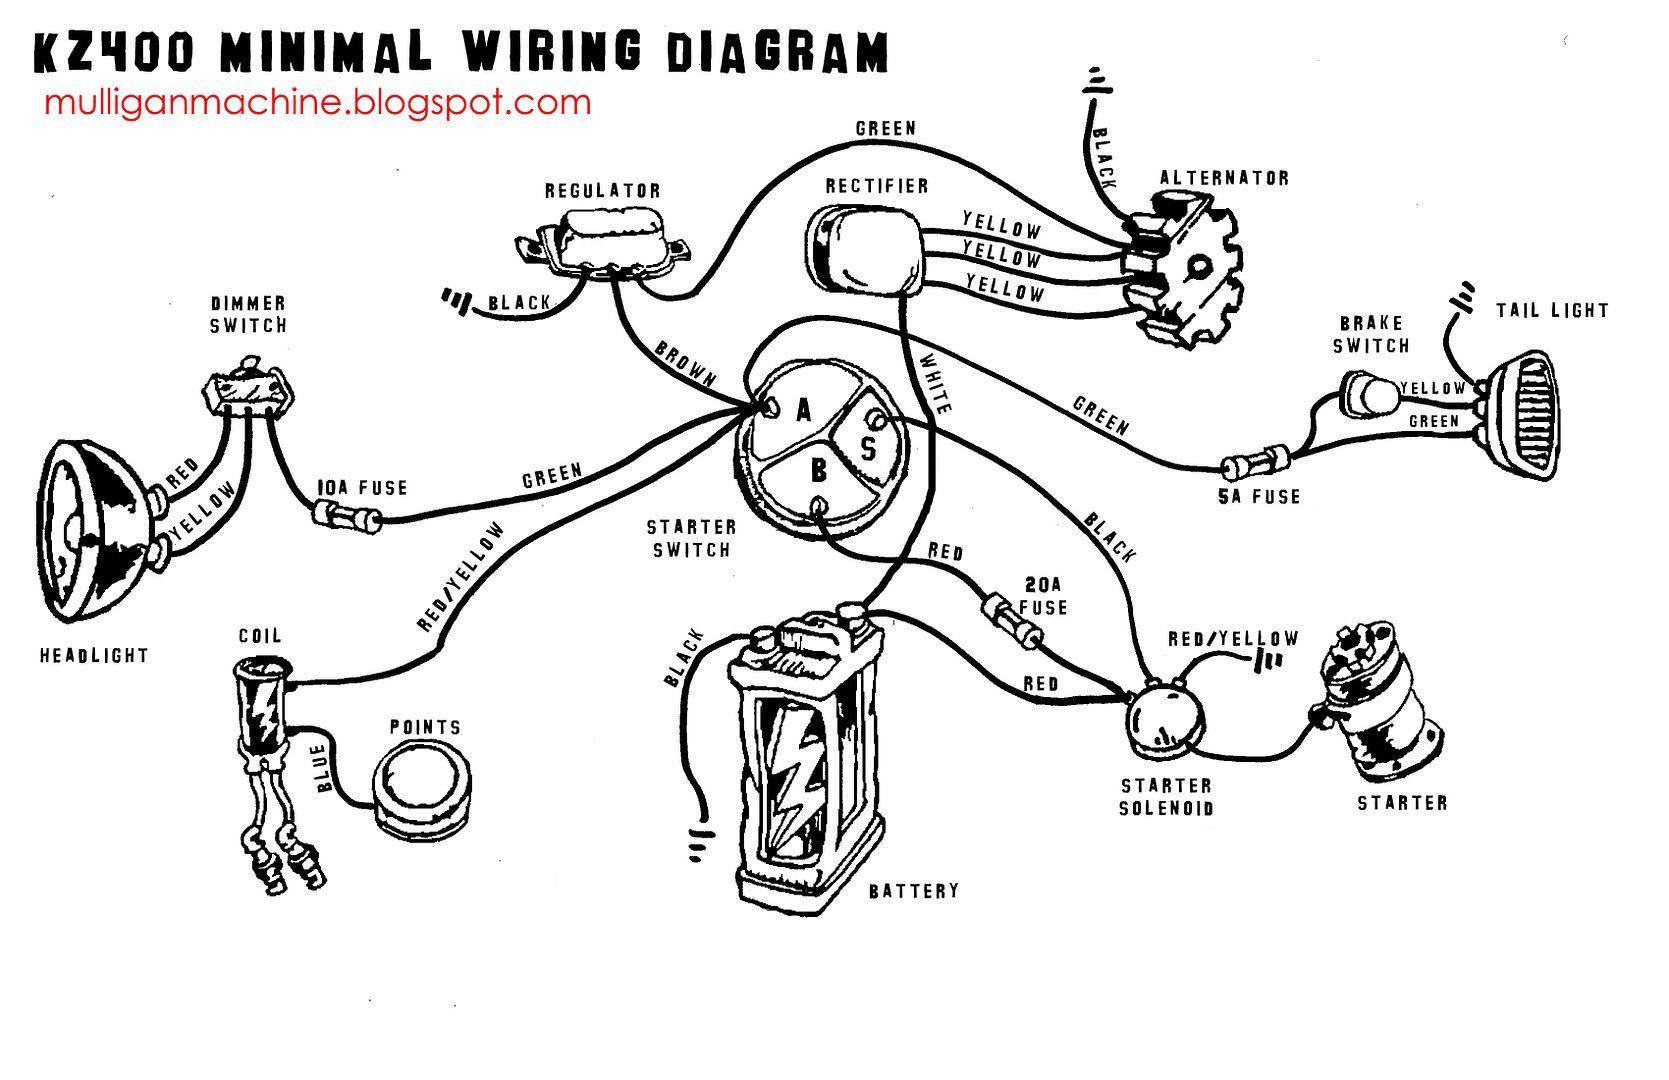 Kz400 Wiring Diagram